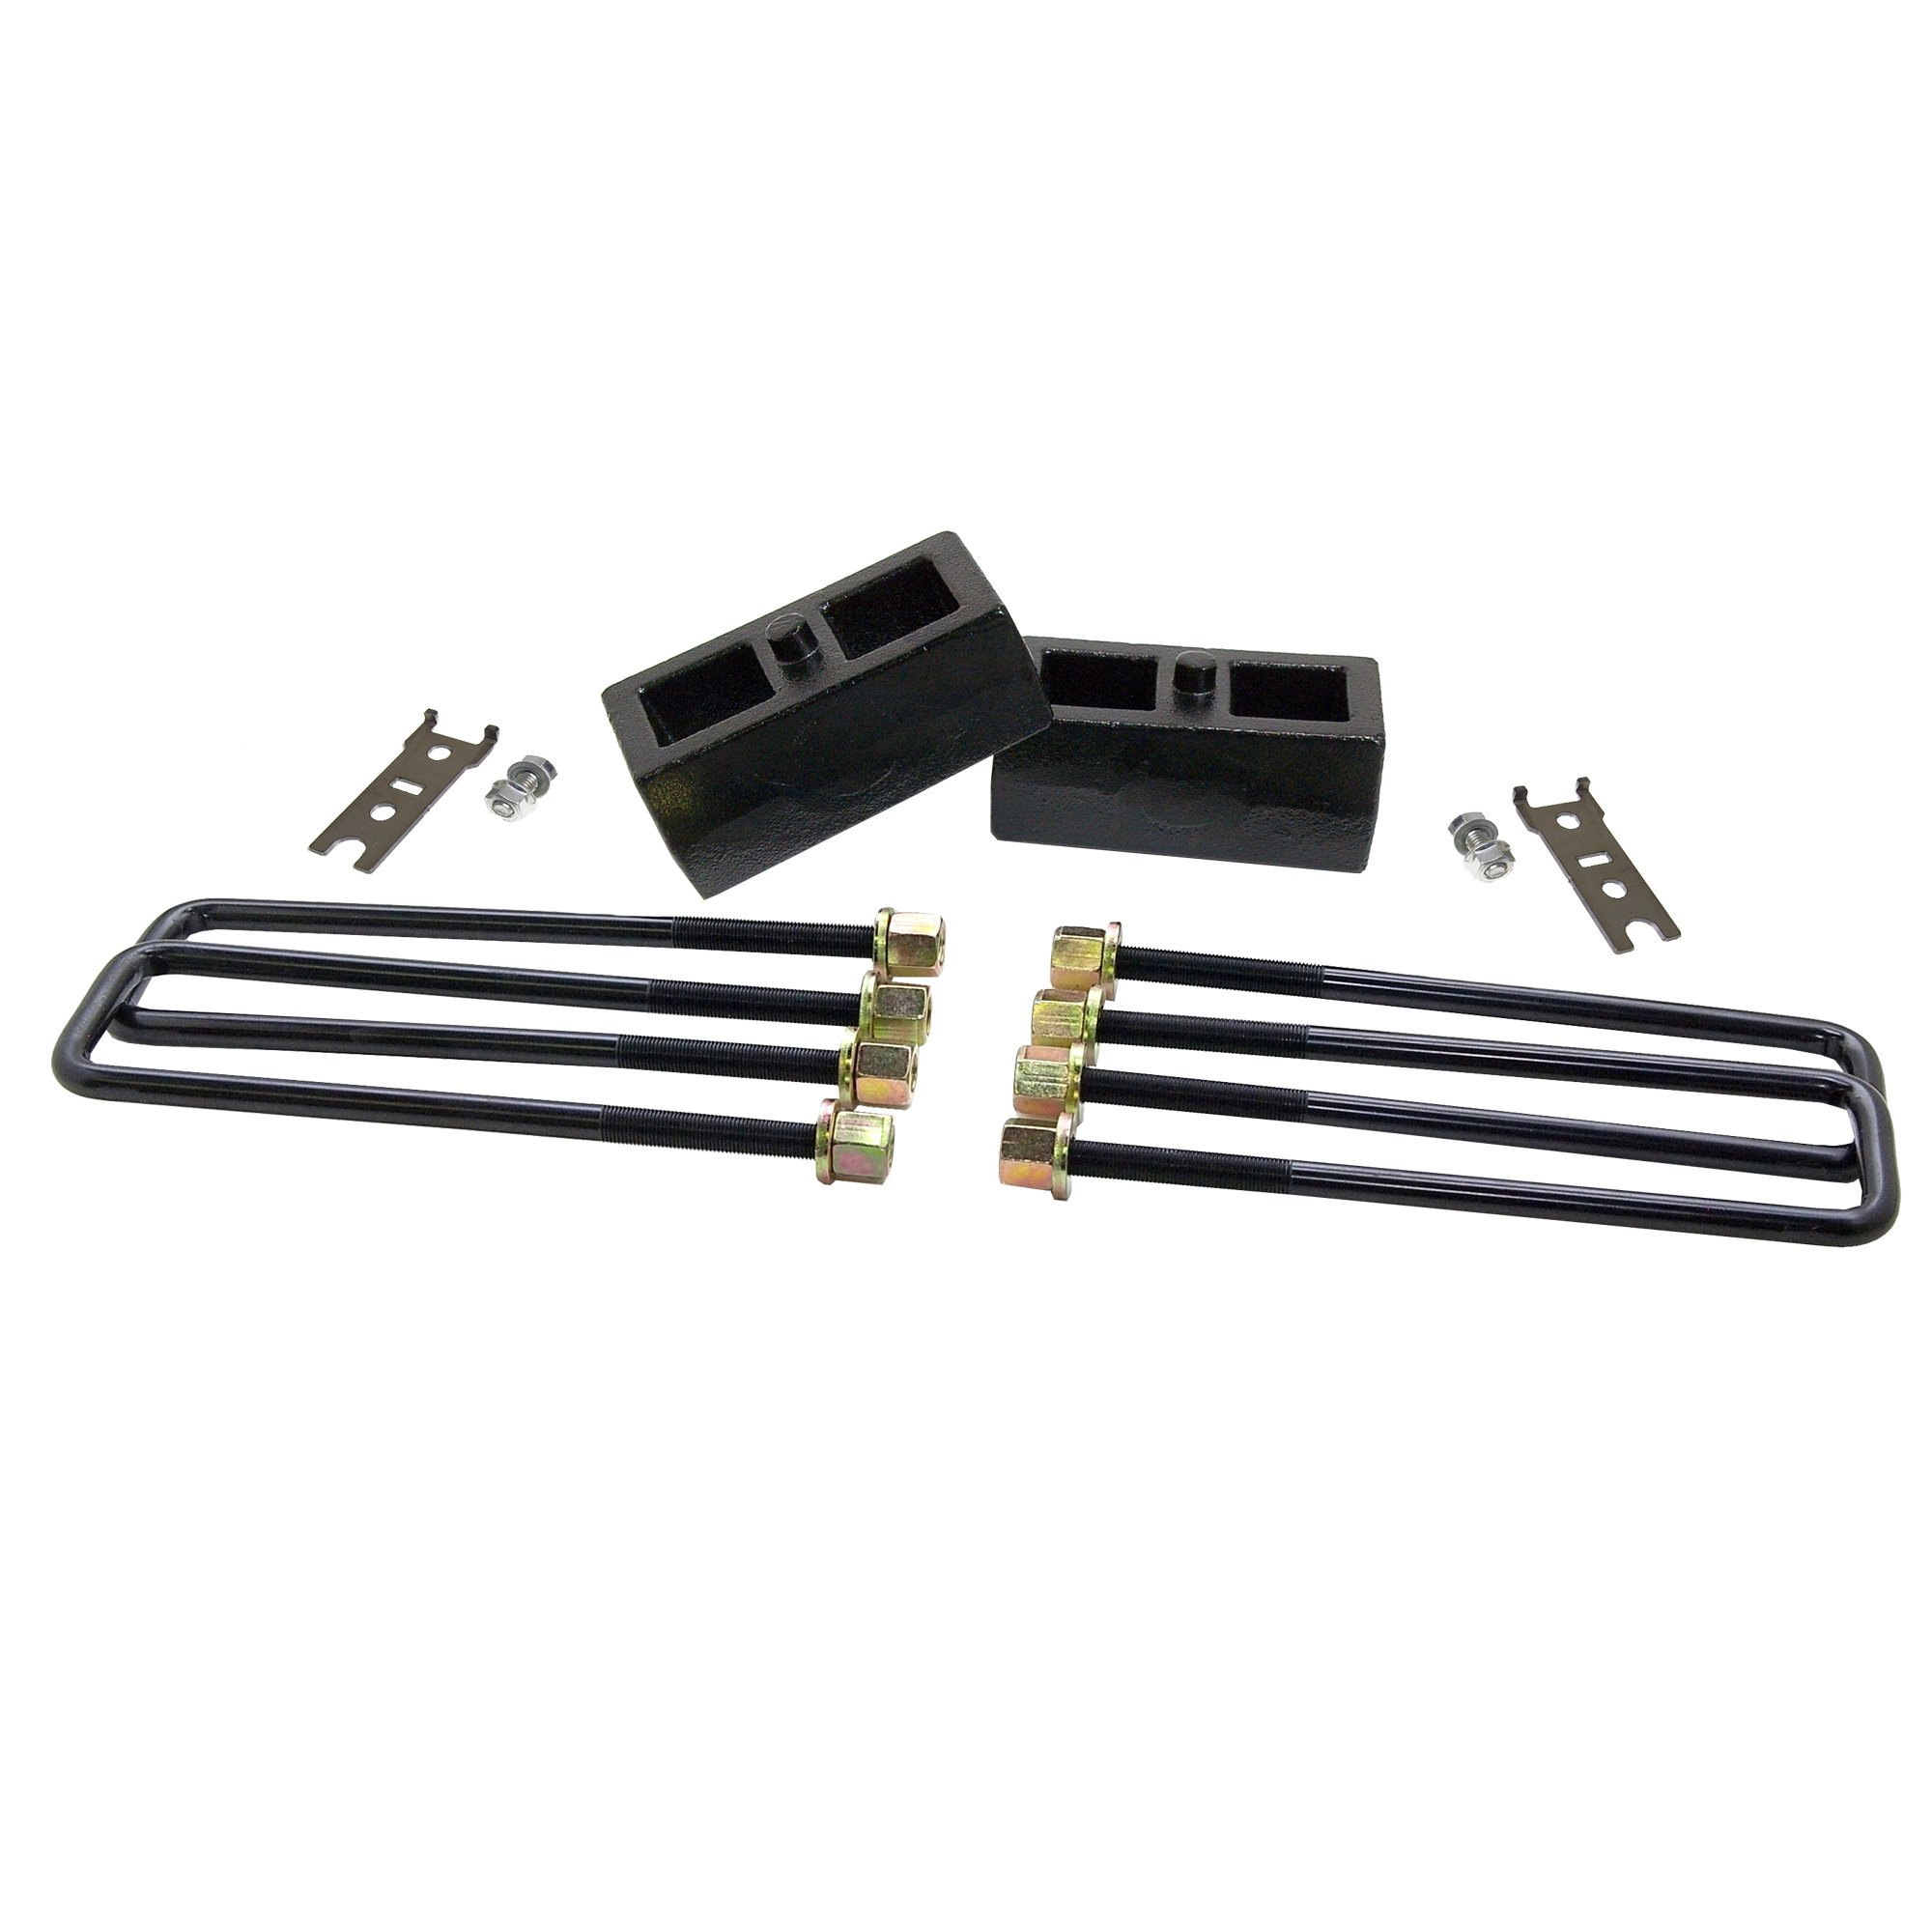 ReadyLift 66-5002 2.0'' Tall Rear Block Kit